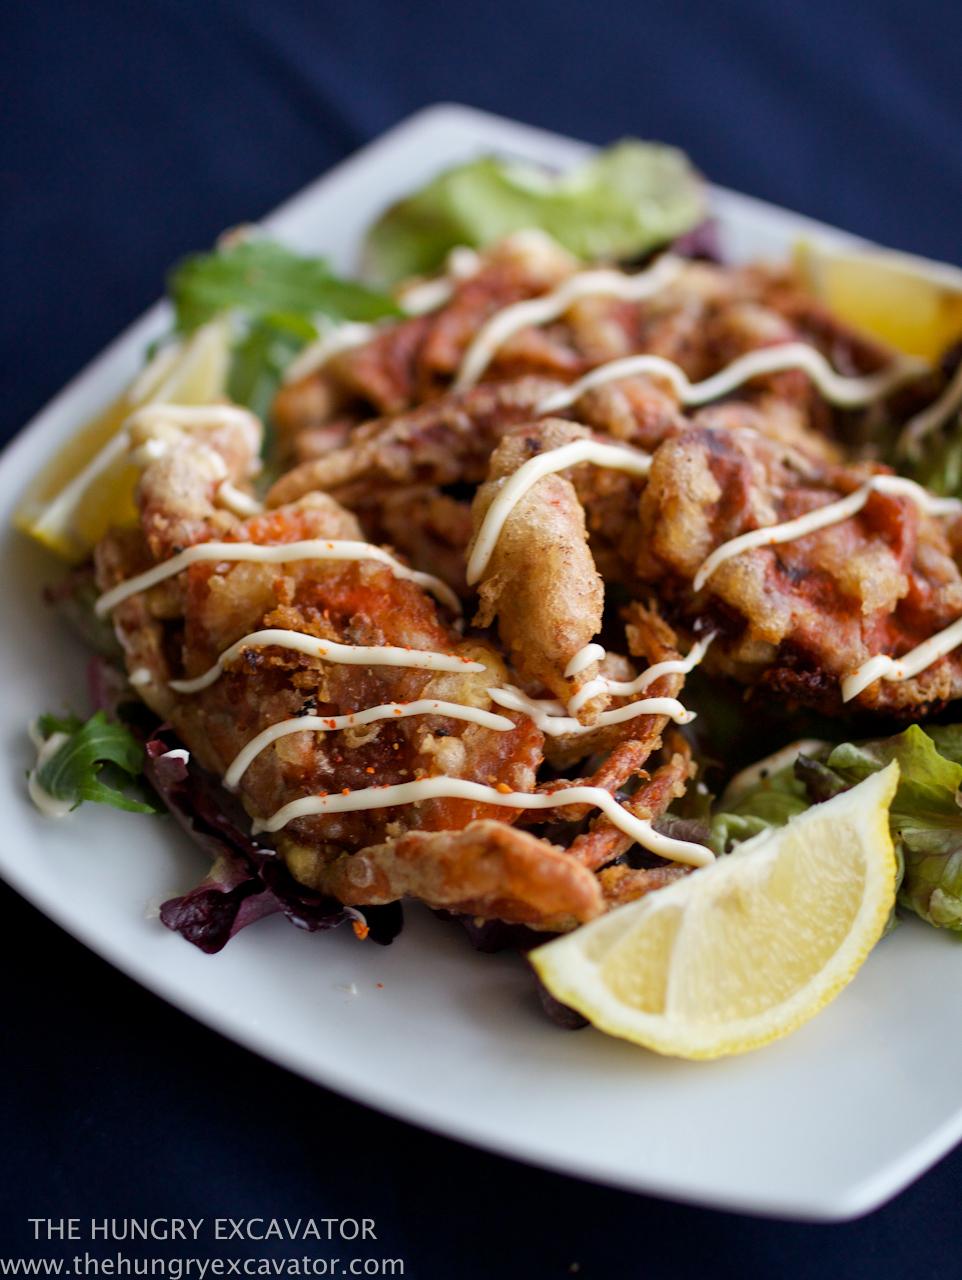 The hungry excavator tempura soft shell crab recipe tempura soft shell crab recipe forumfinder Gallery